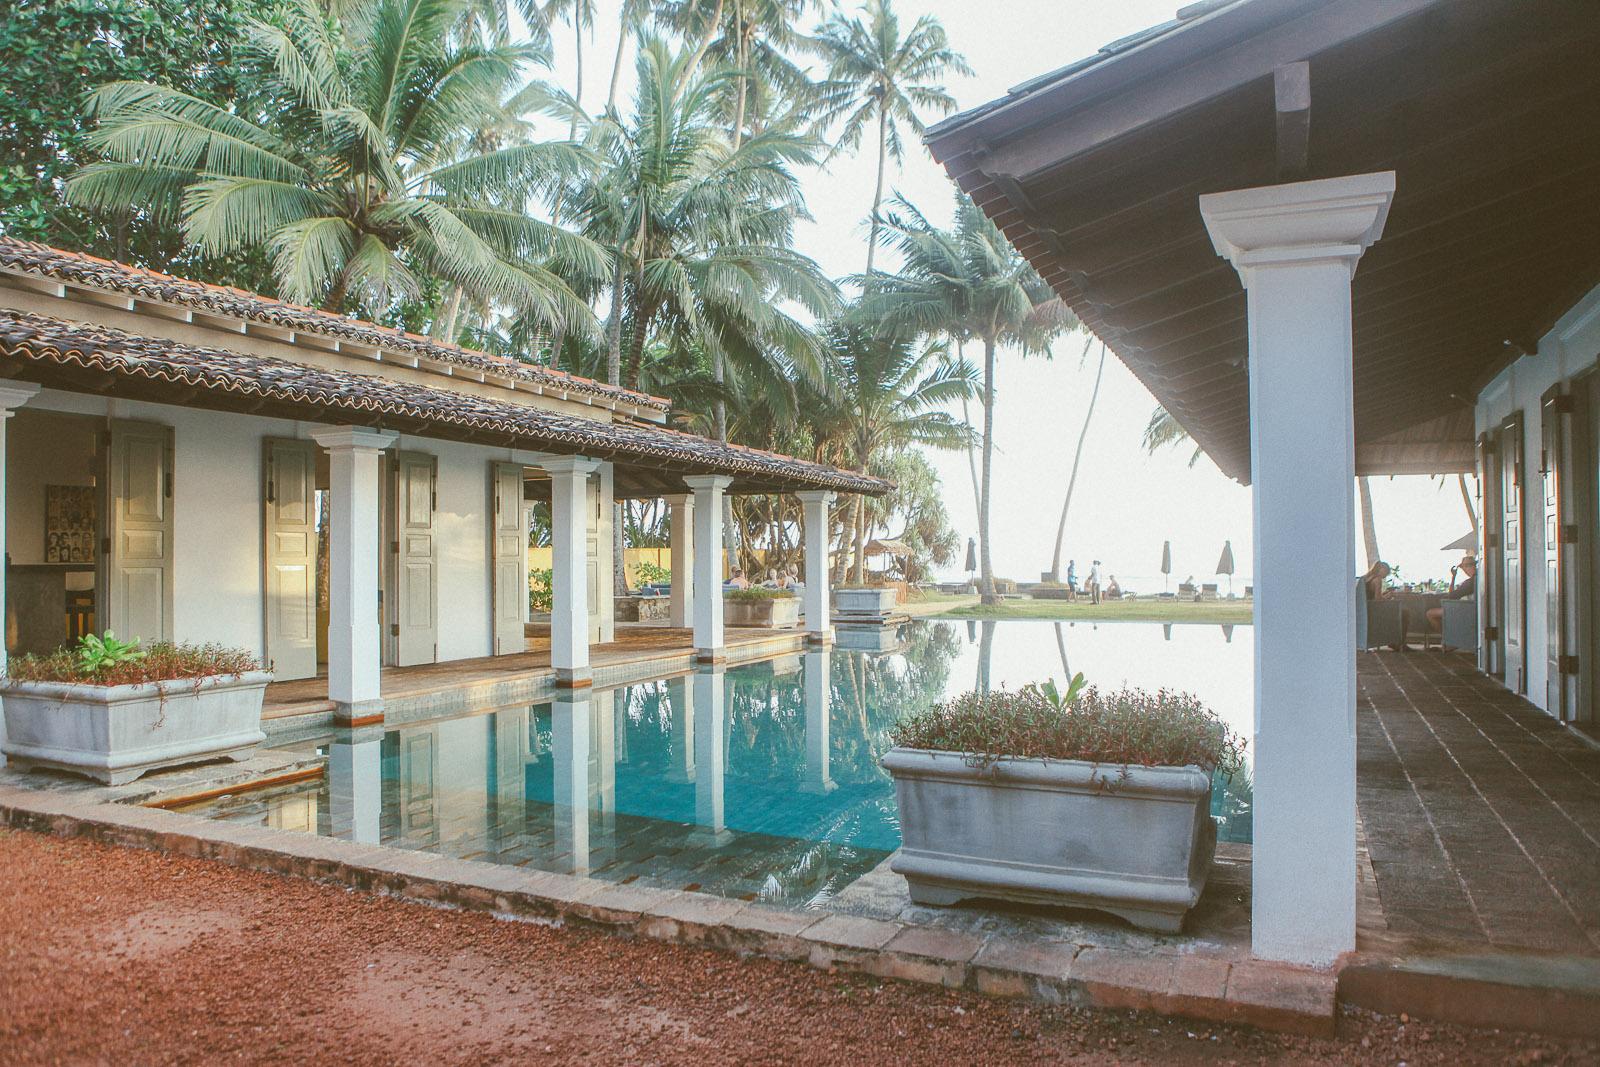 Sri Lanka-Hikkaduwa-Midigama-thalpe-era-beach-jetwing-surf-travel-blog-IMG_8642